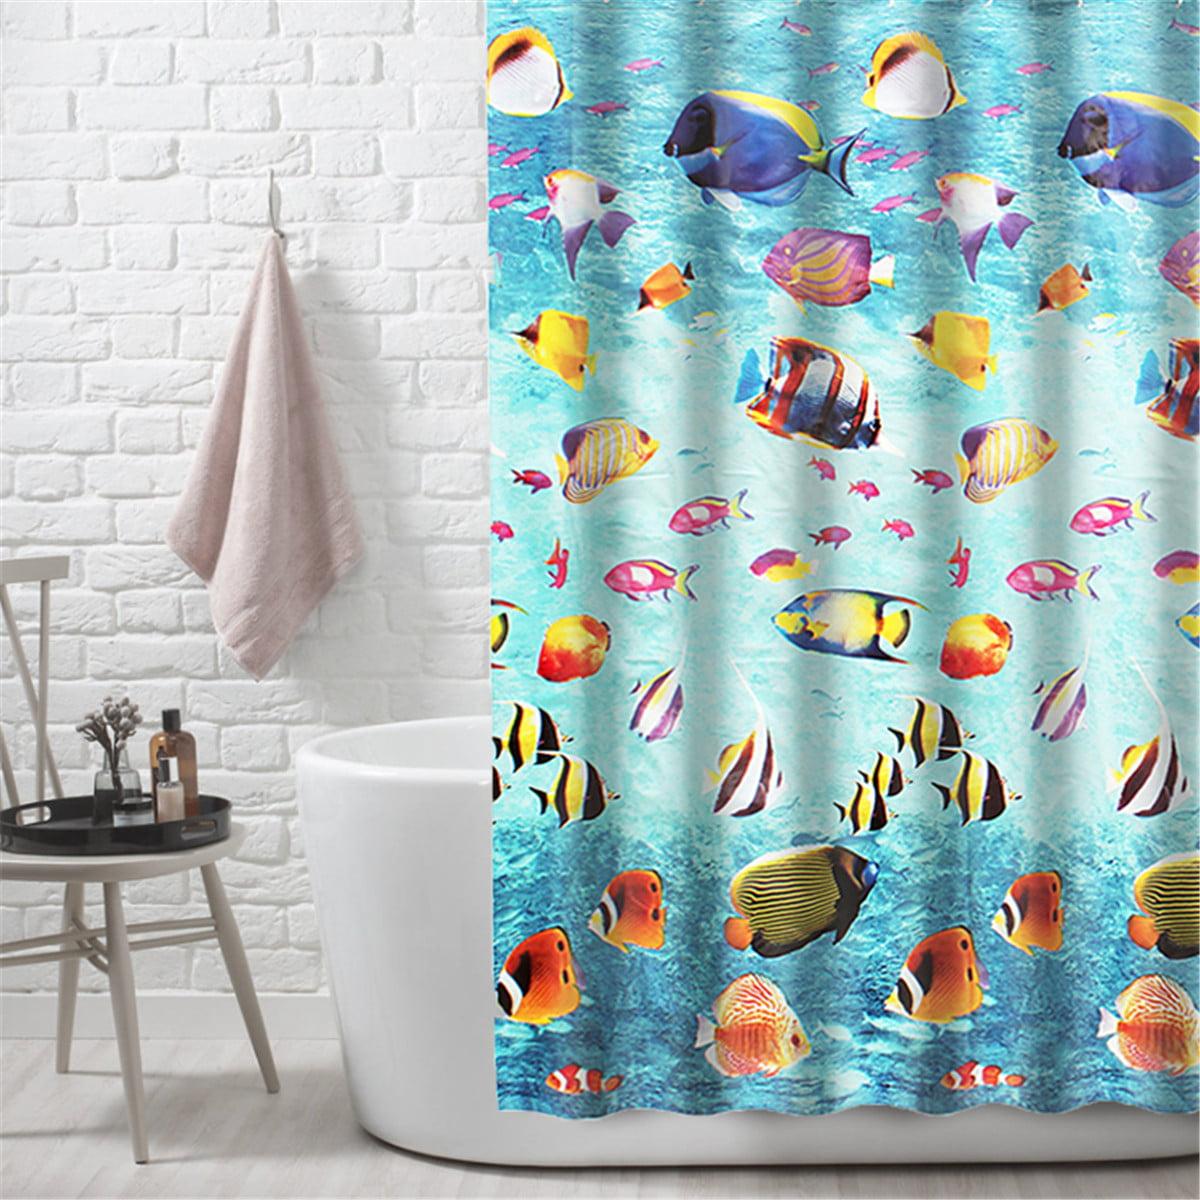 Underwater Shower Curtain Ocean Transparent Underwater Landscape With Tropical Fish Eva Clear Plastic Bathroom Shower Curtain Mildew Resistant Waterproof 70x70 Inches Walmart Com Walmart Com